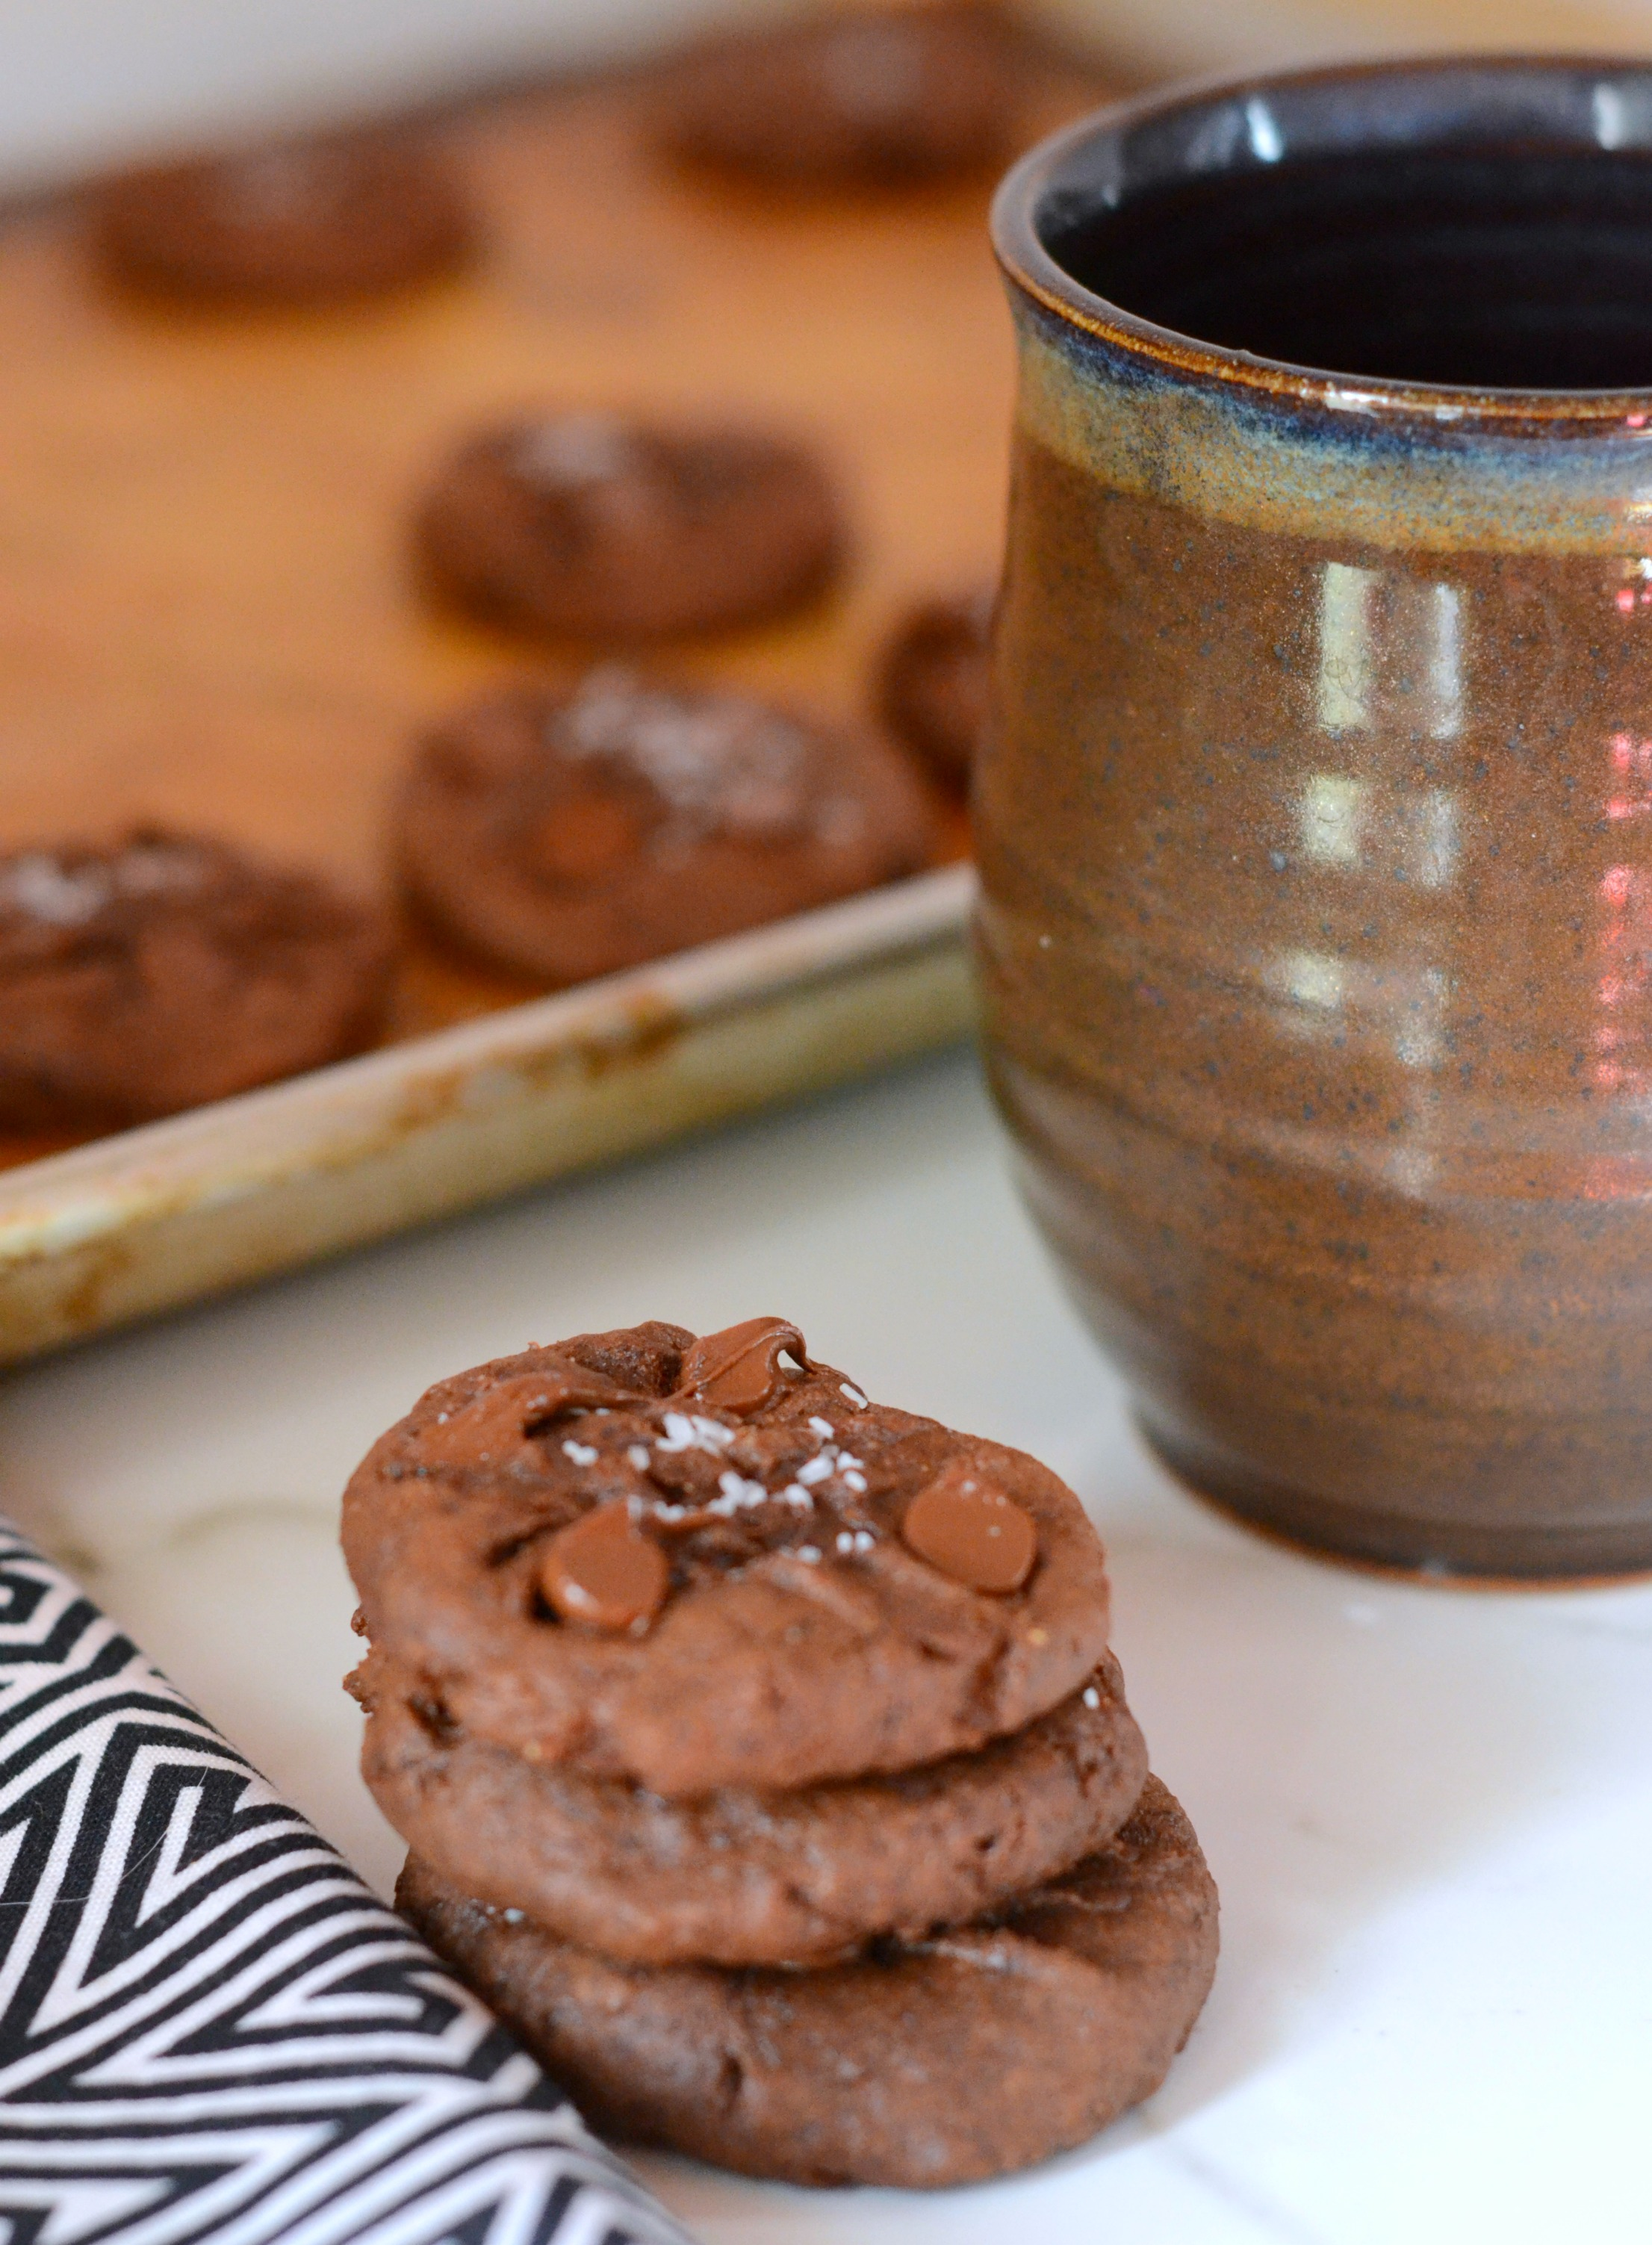 stack of chocolate fudge cookies